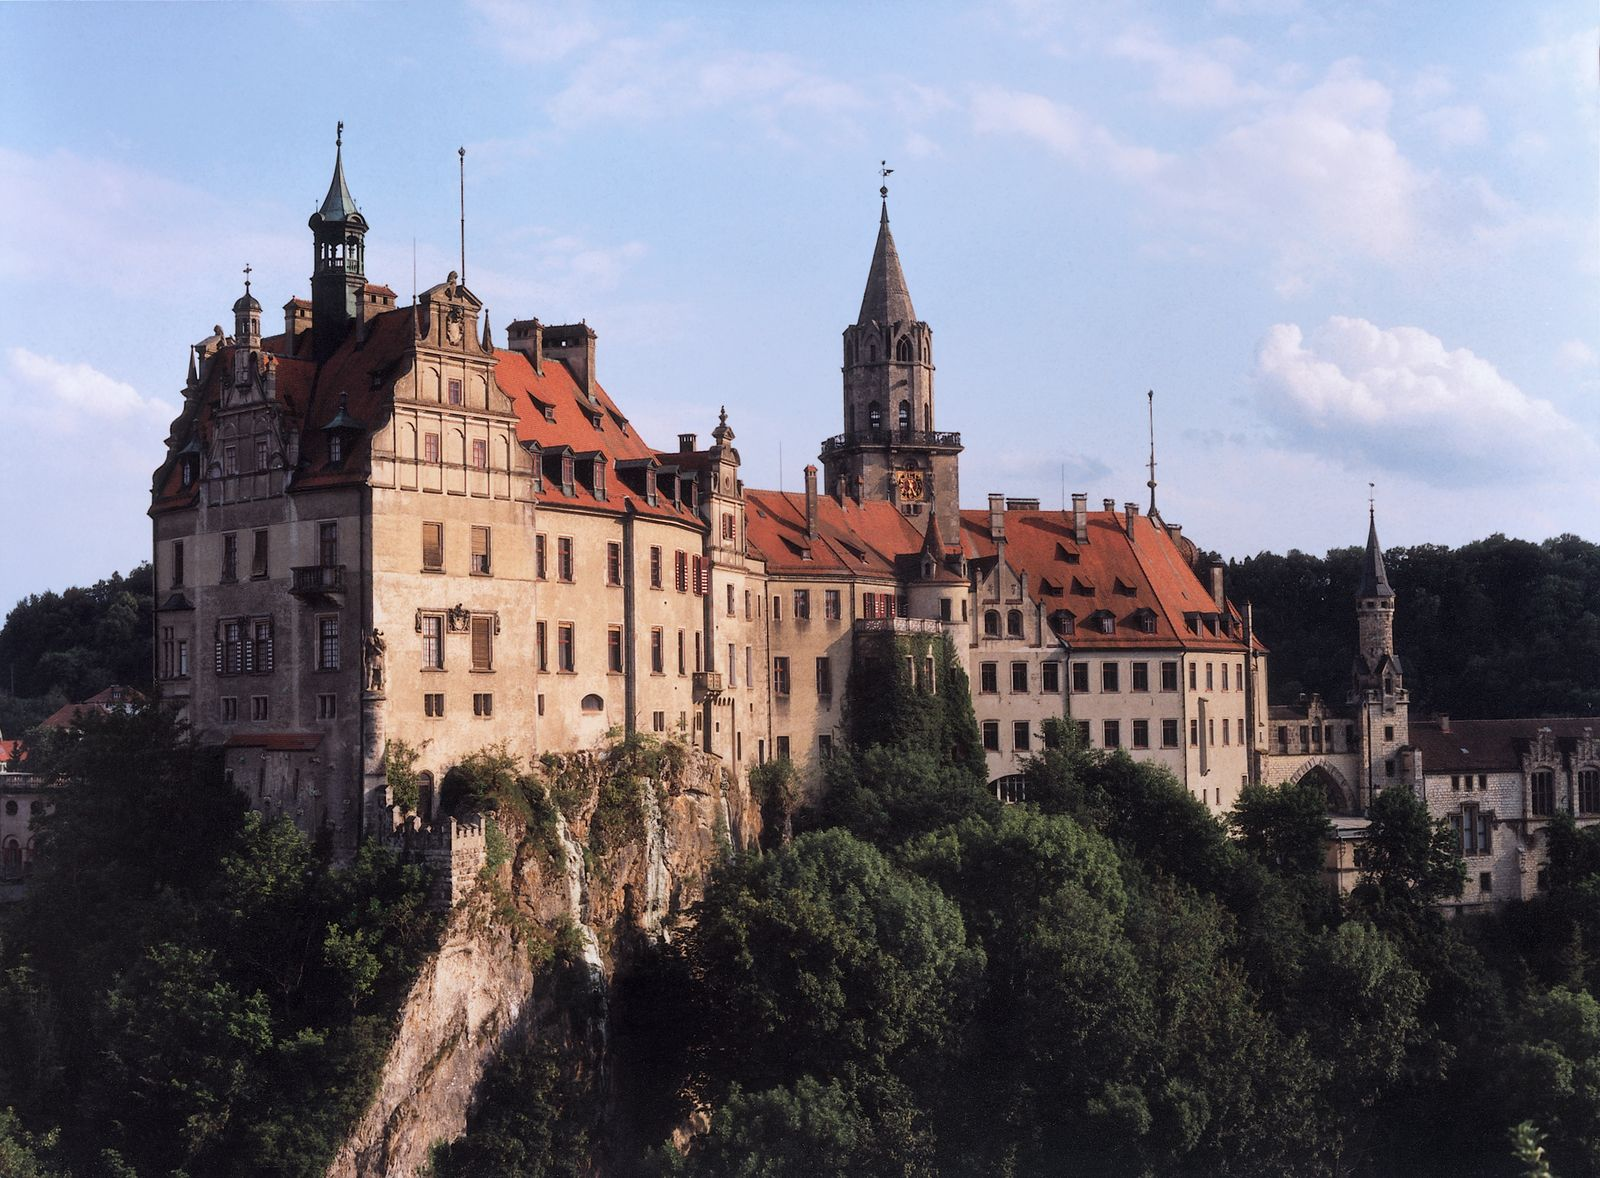 Sigmaringen castle on the Danube